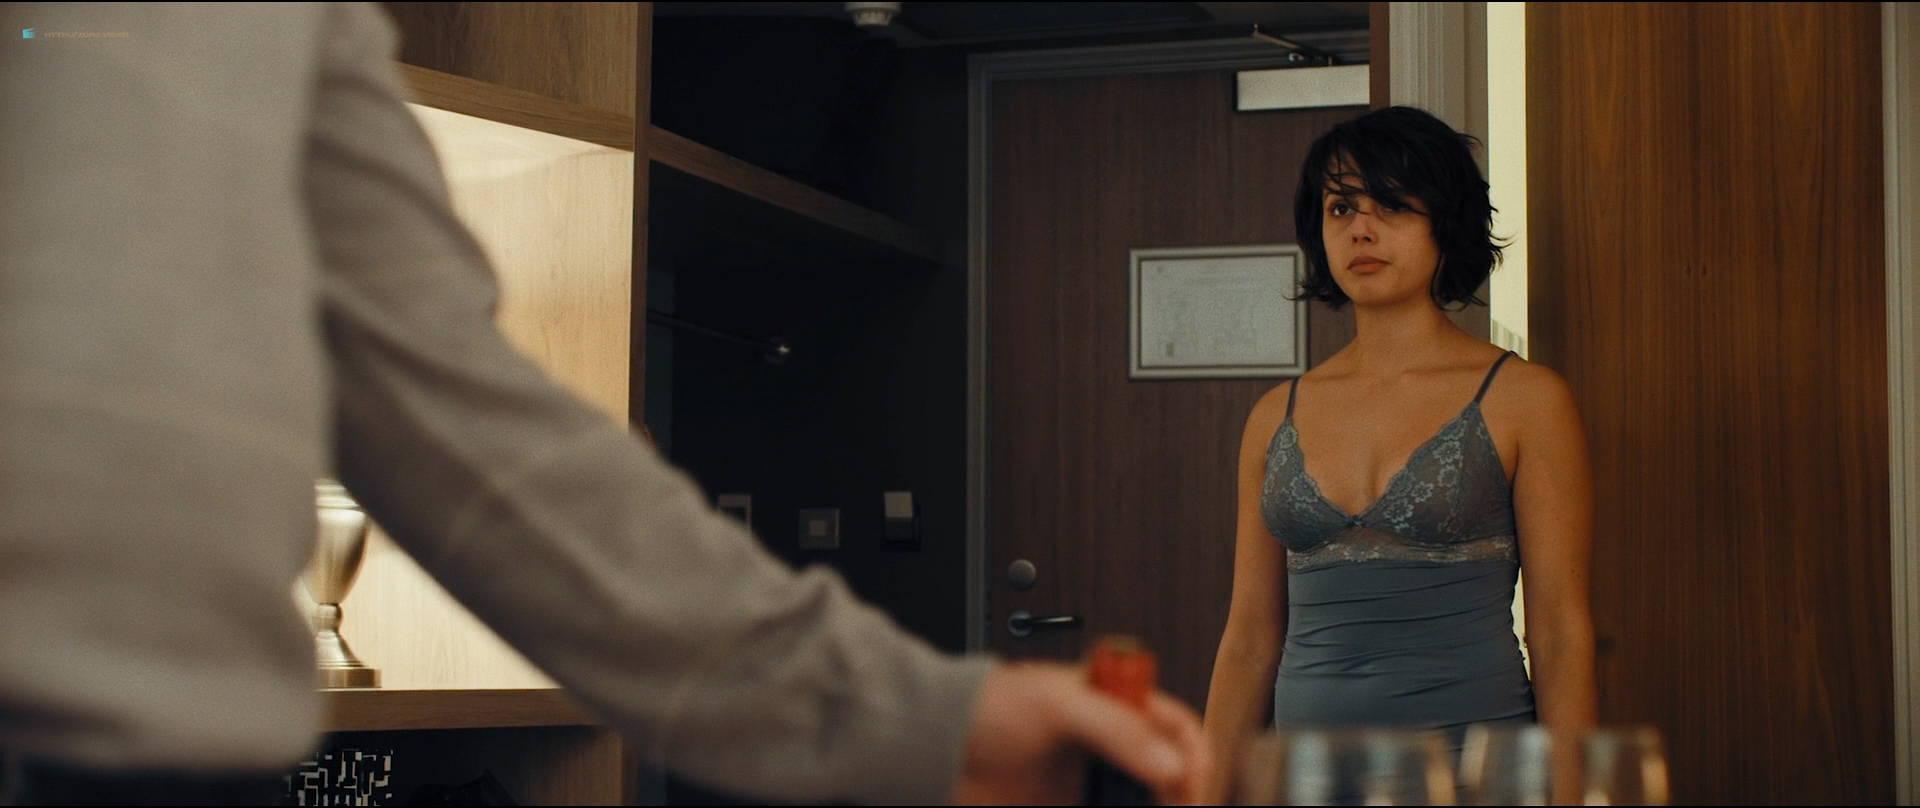 Chloe Heaver Nude Topless Kacey Clarke, Amrita Acharia Hot -8655